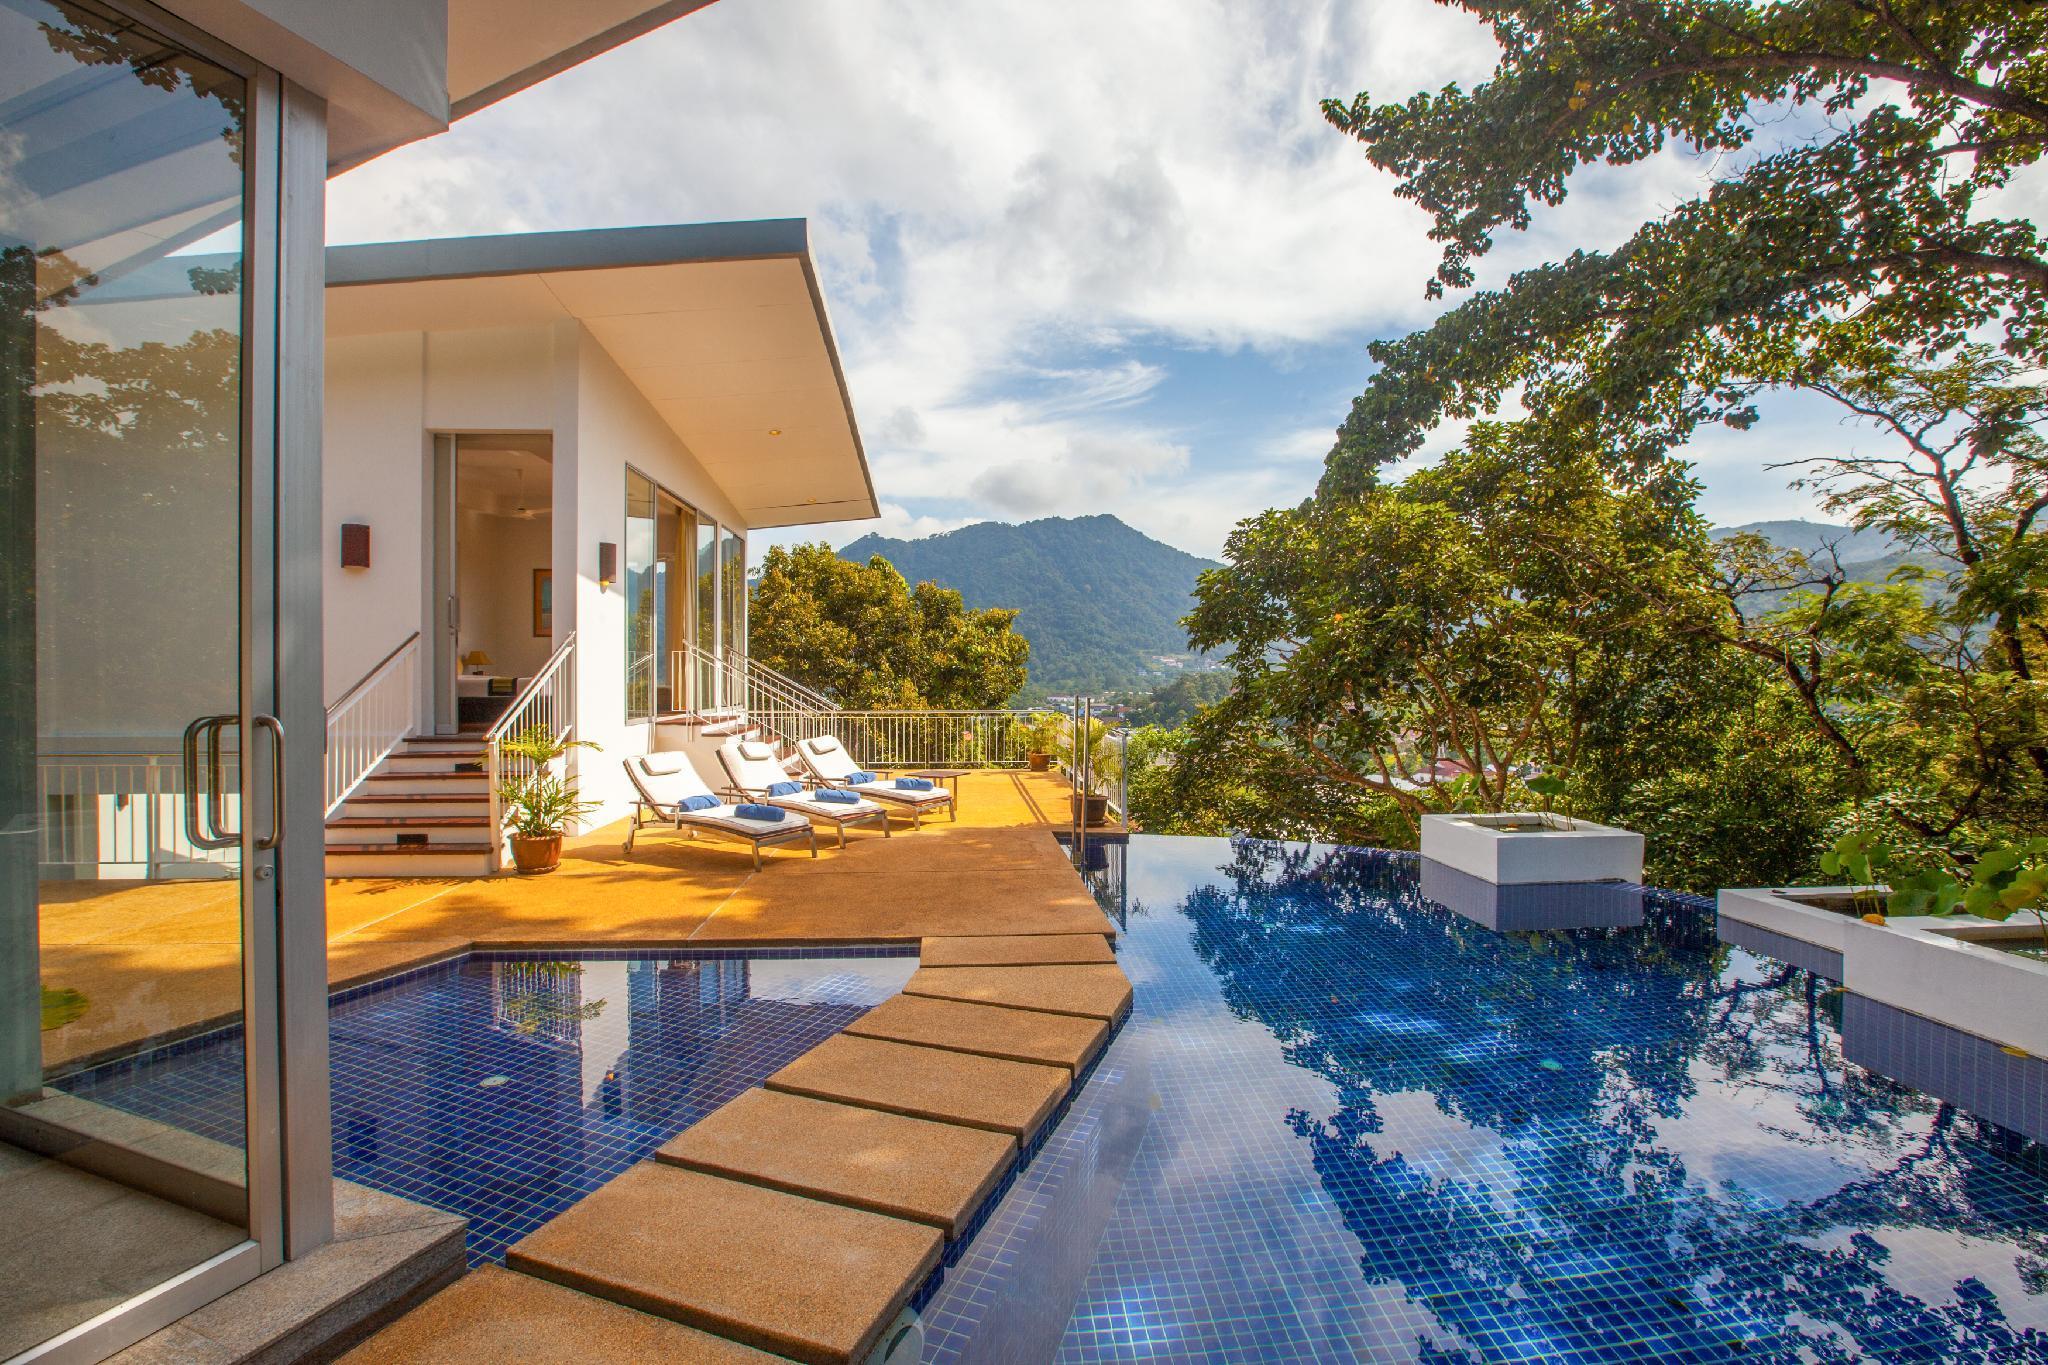 6 Bedroom Pool Villa Cluster 2